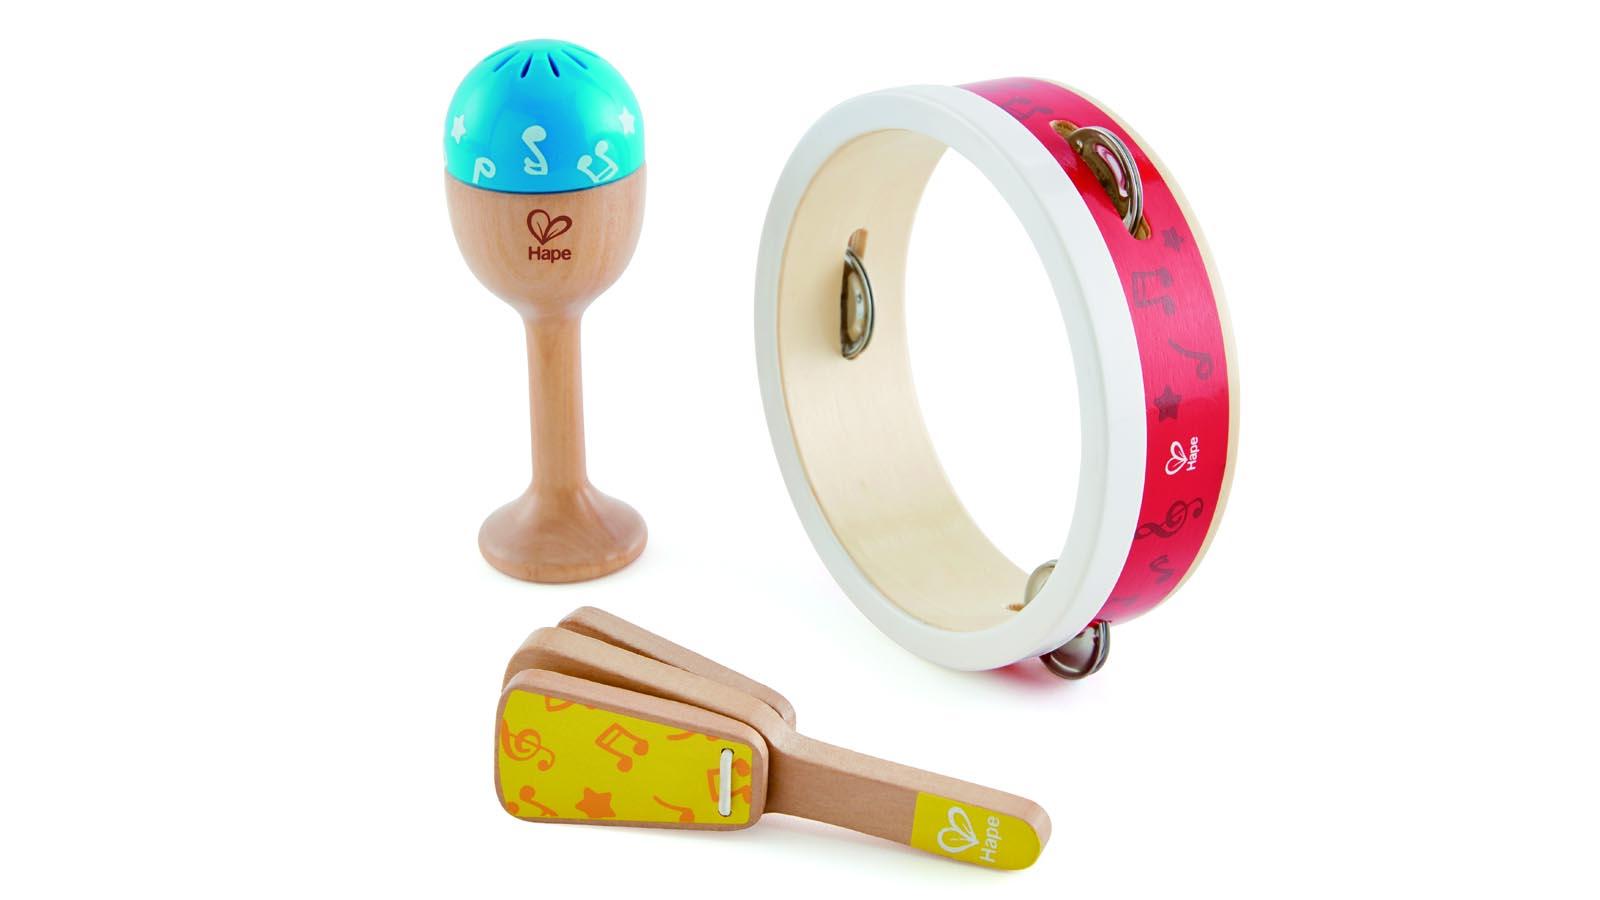 Hape Spielzeug Junior Perkussion Set